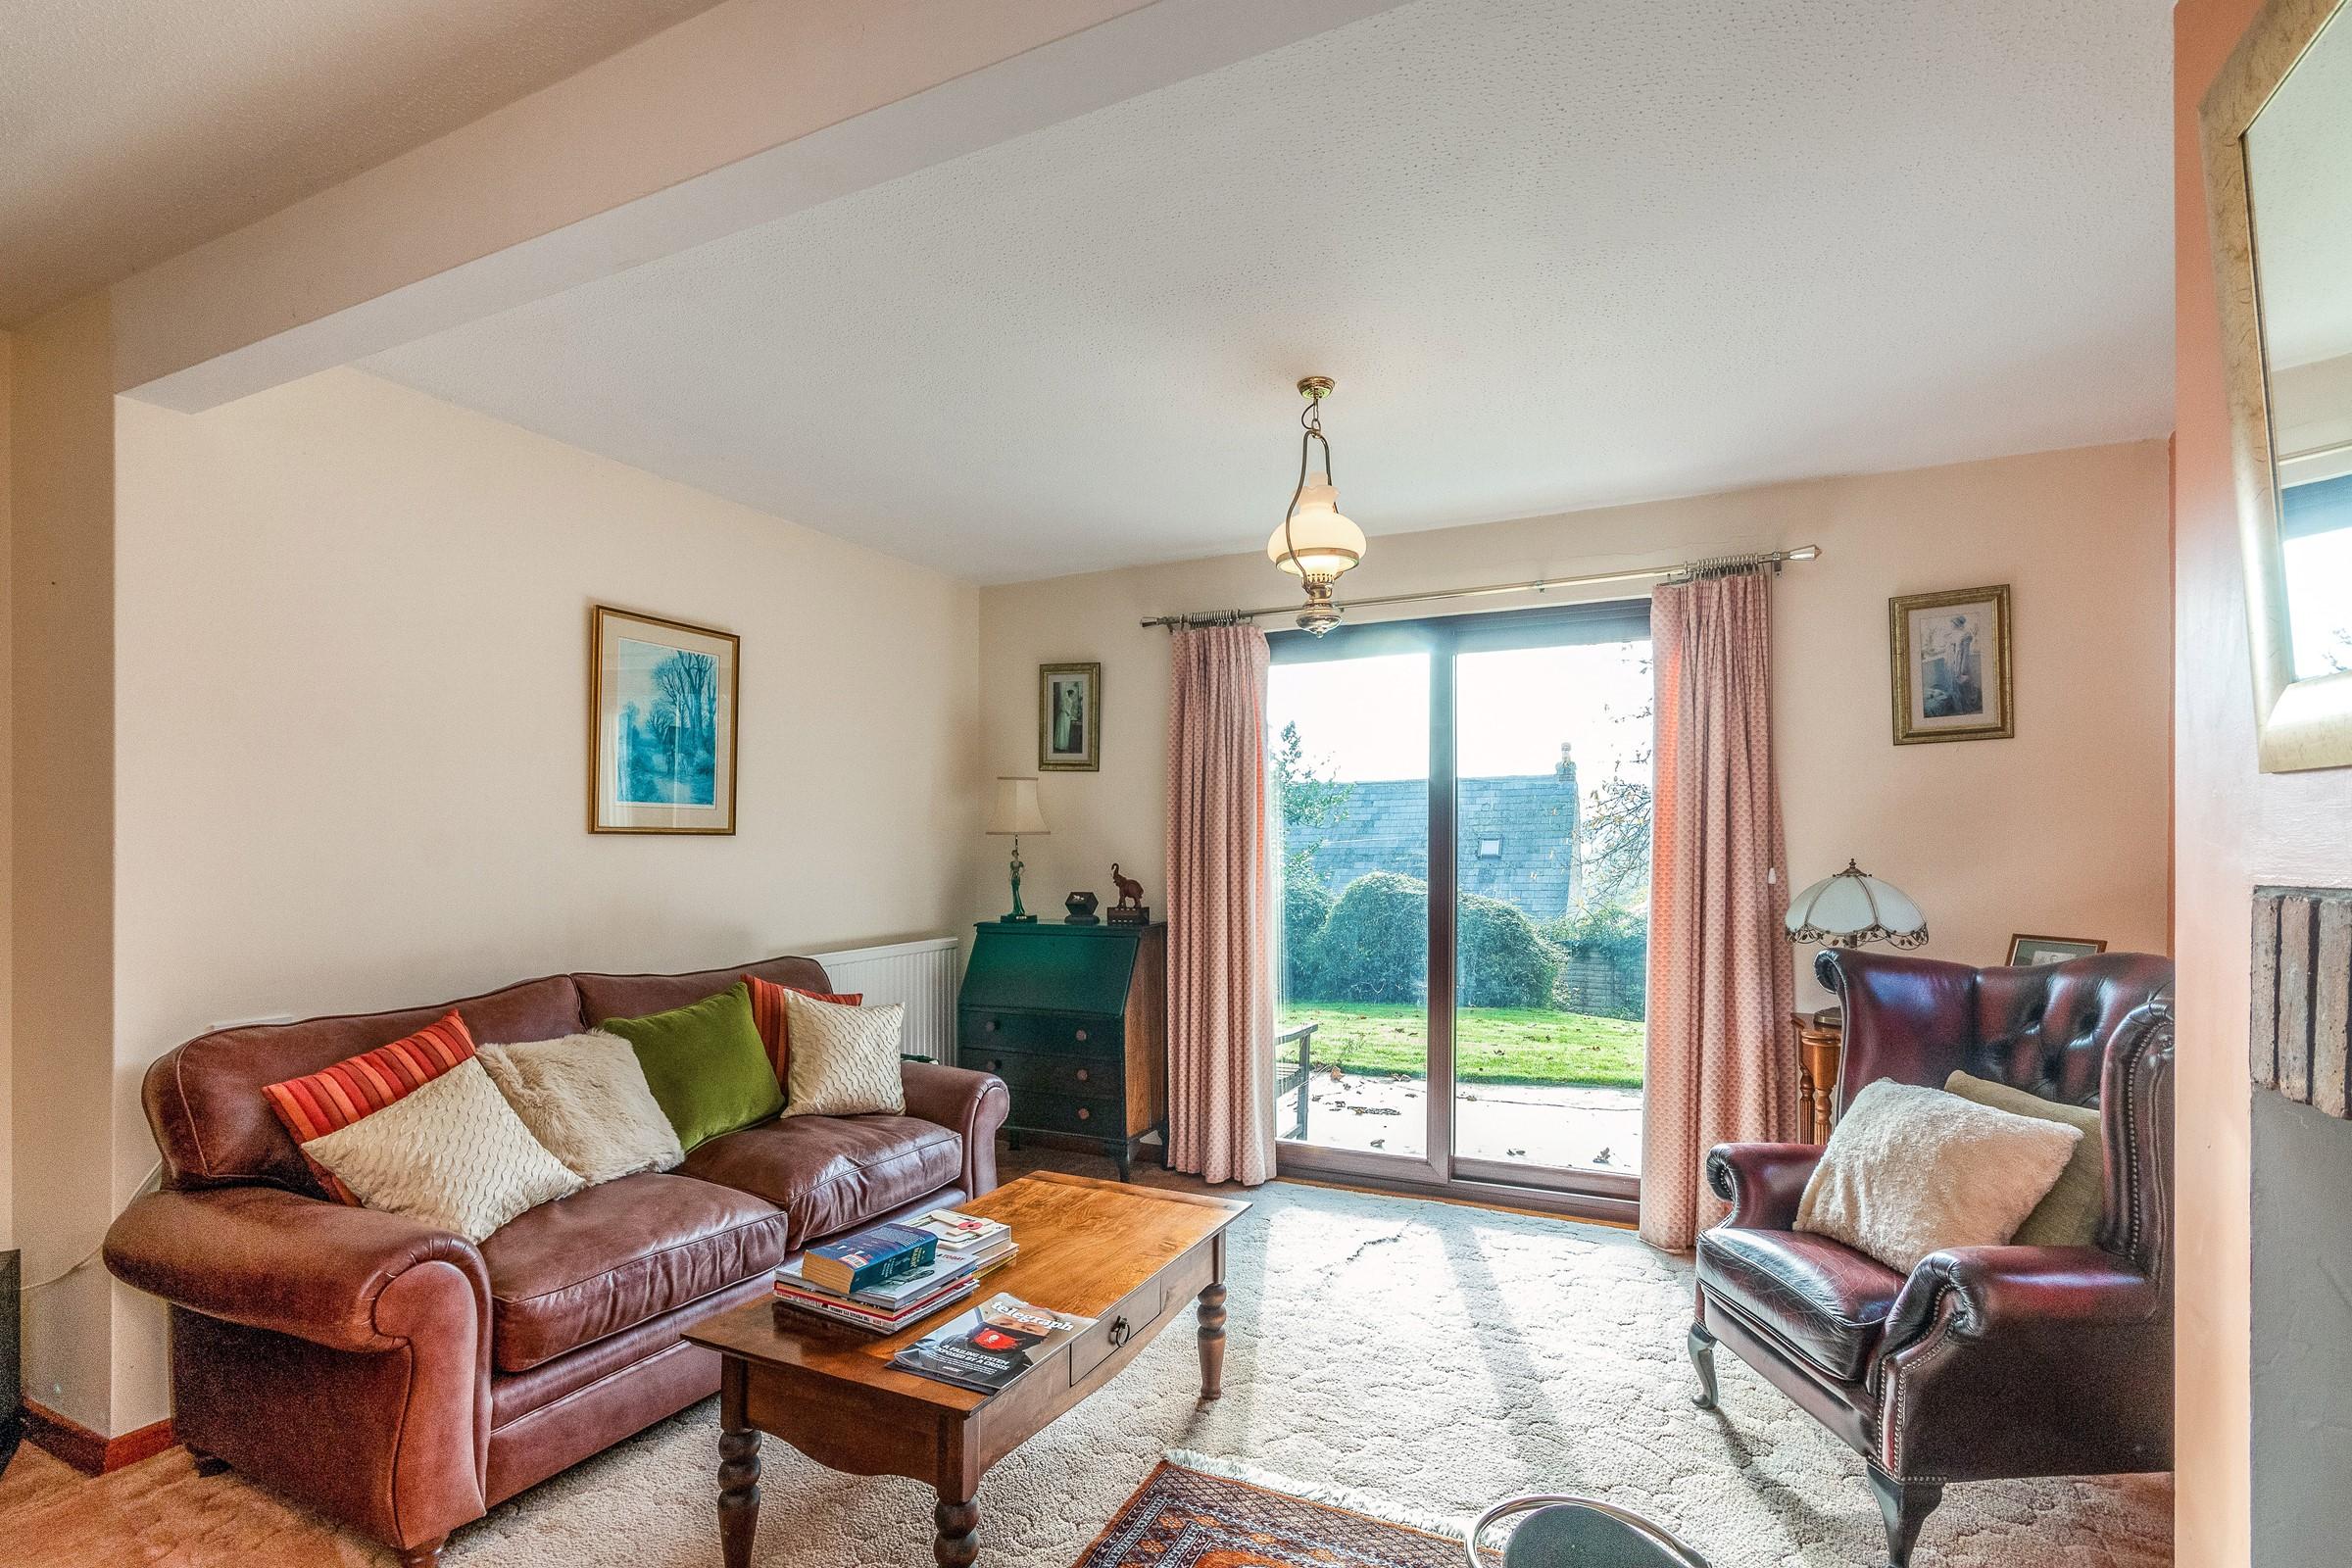 Brook Lane, Chillerton, Newport, Isle Of Wight, PO30